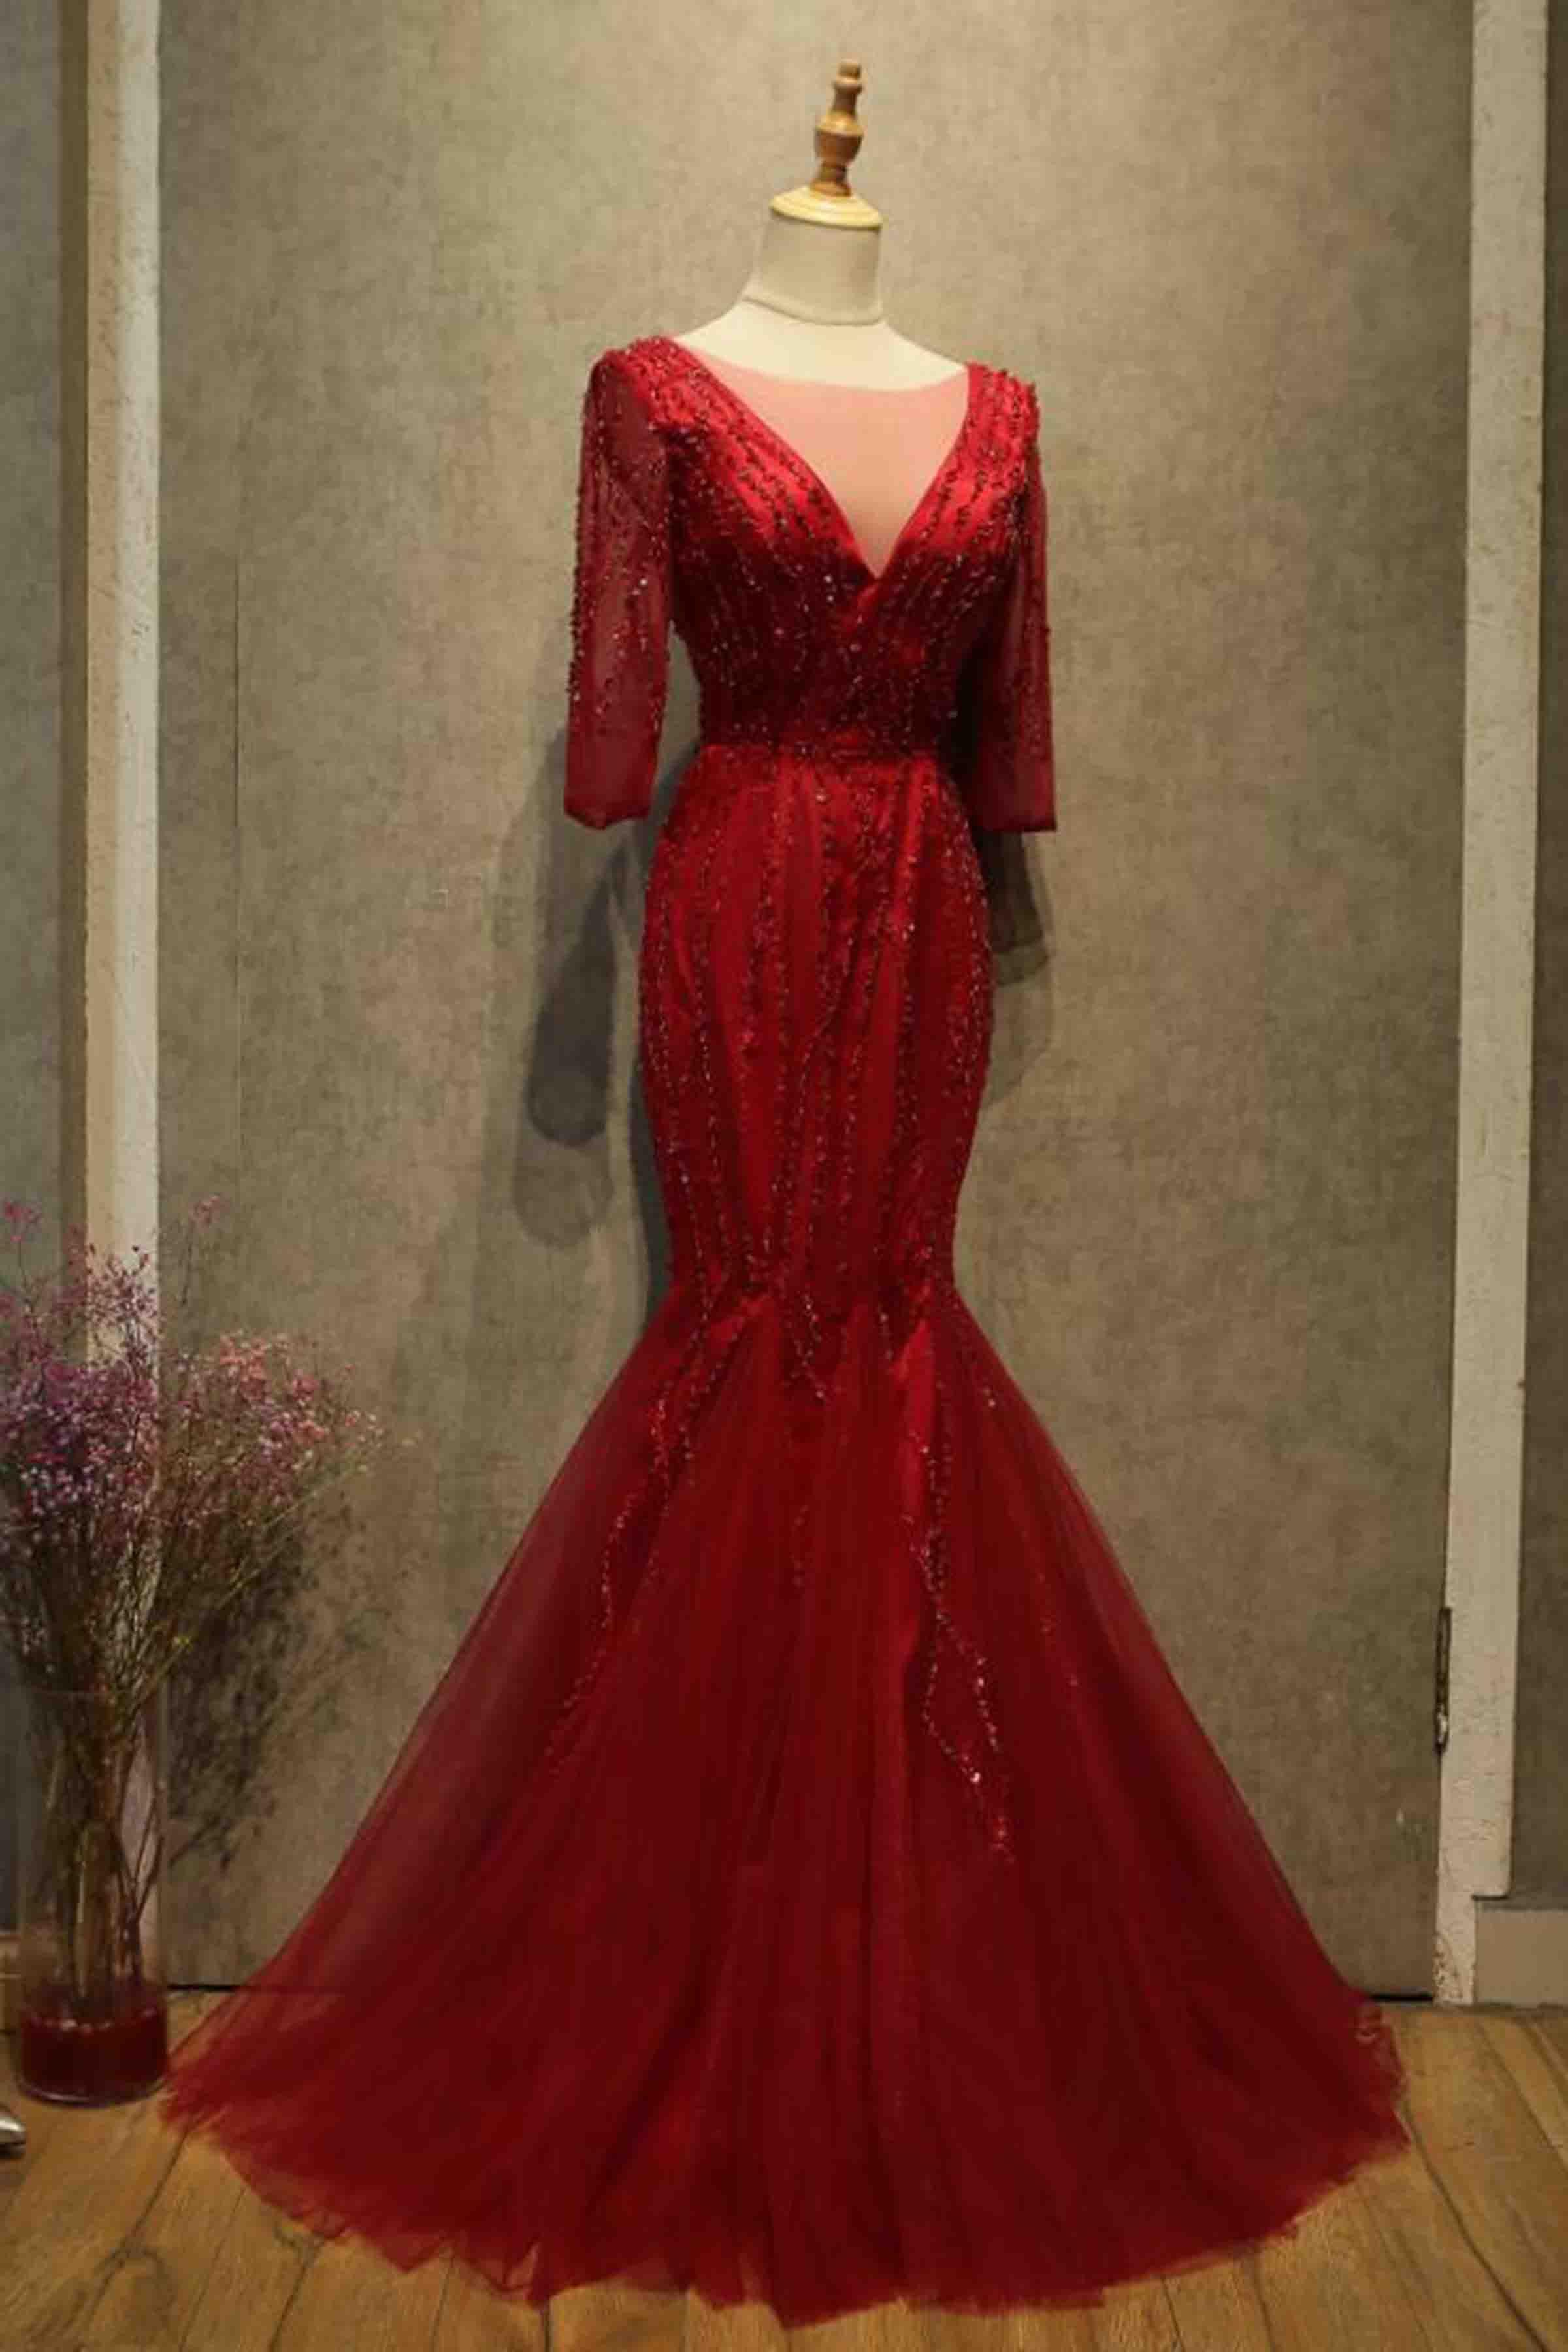 fb8c37d6 Red tulle half sleeves v neck mermaid sequins floor-length A-line prom  dresses #promdress